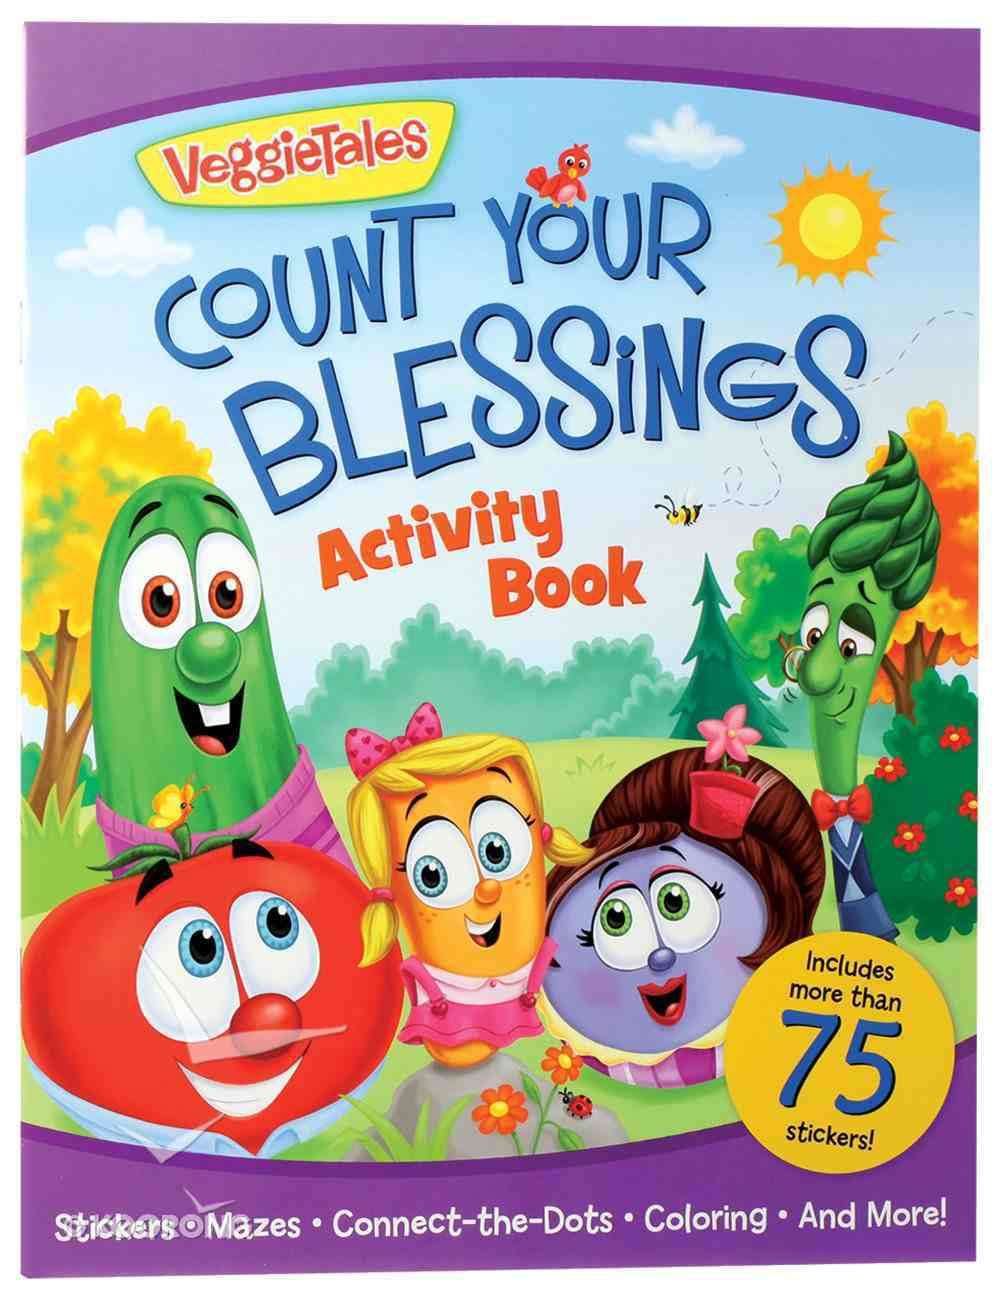 Count Your Blessings Activity Book (Veggie Tales (Veggietales) Series) Paperback